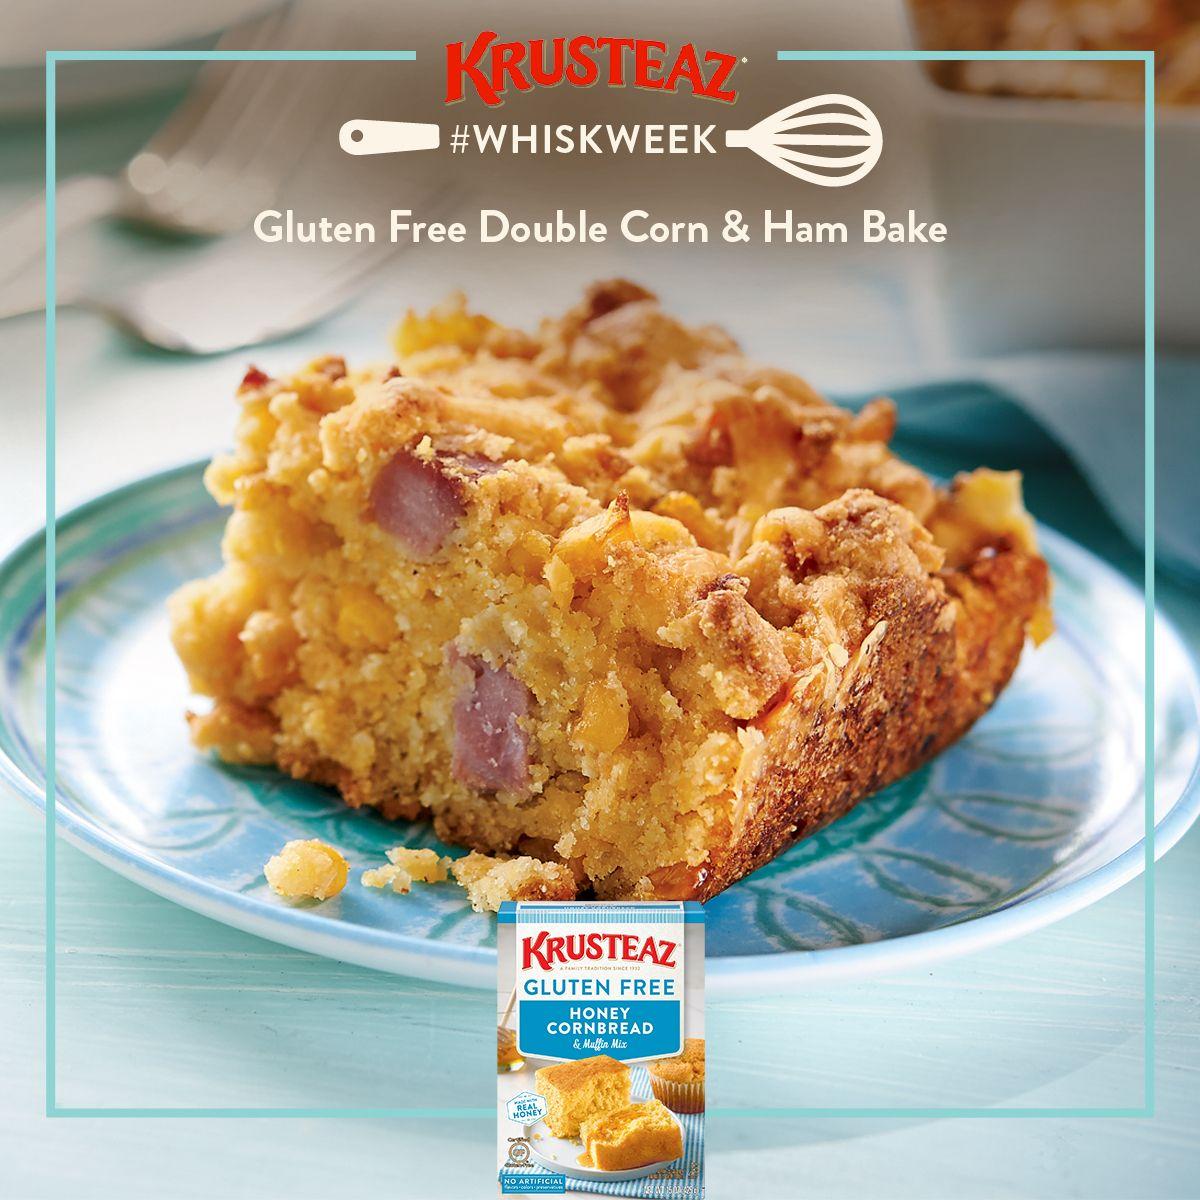 Krusteaz Double Corn Ham Bake Recipe Recipe In 2020 Honey Cornbread Krusteaz Gluten Free Gluten Free Recipes Easy